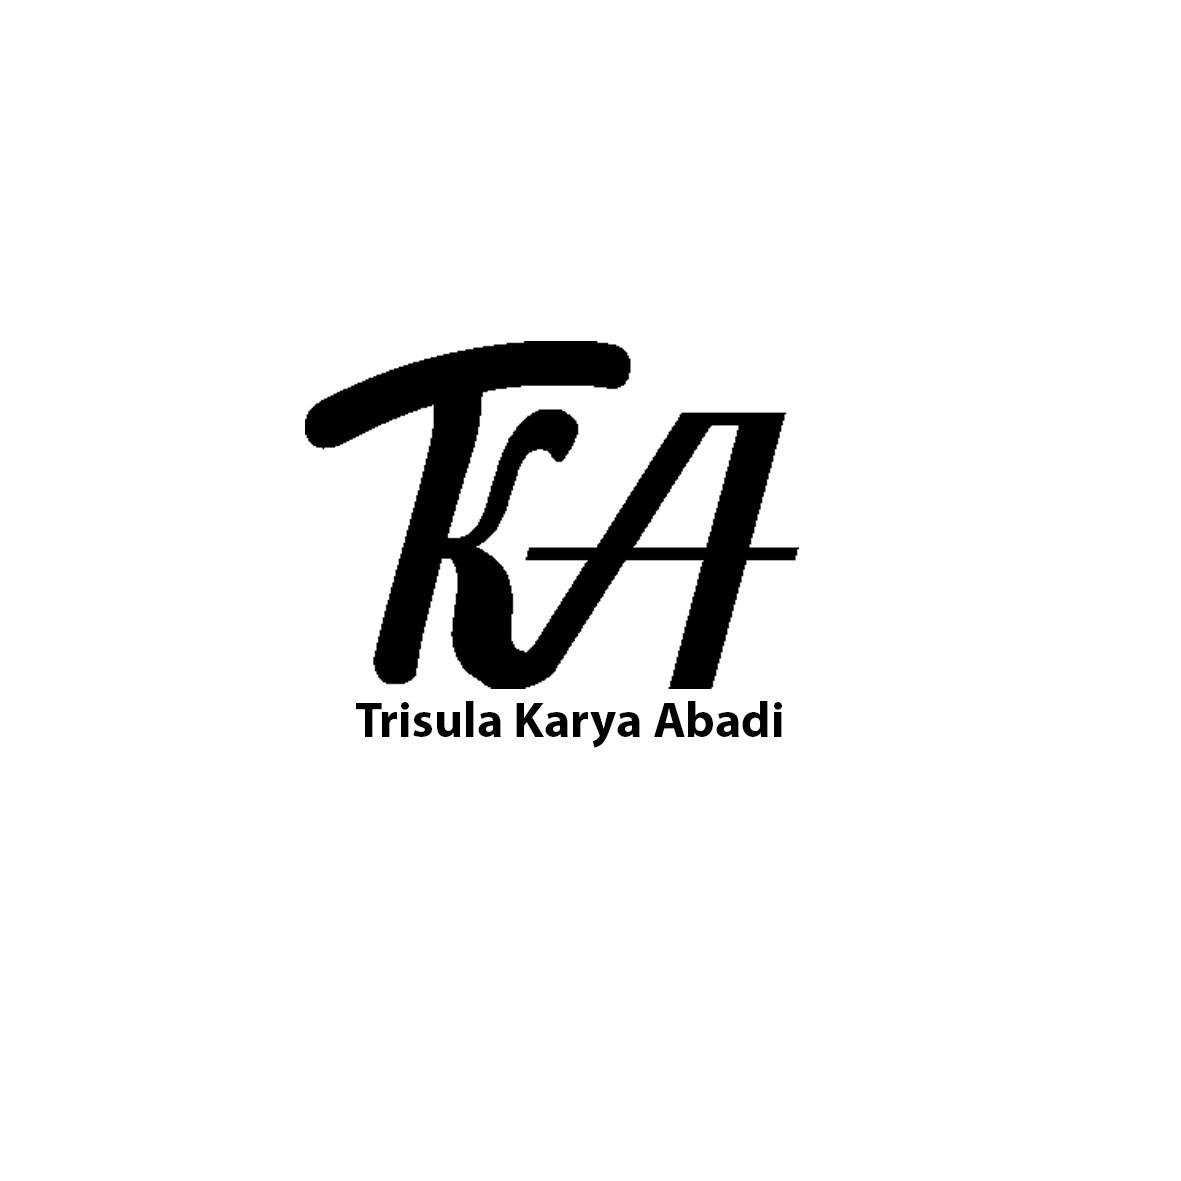 Trisula Karya Abadi